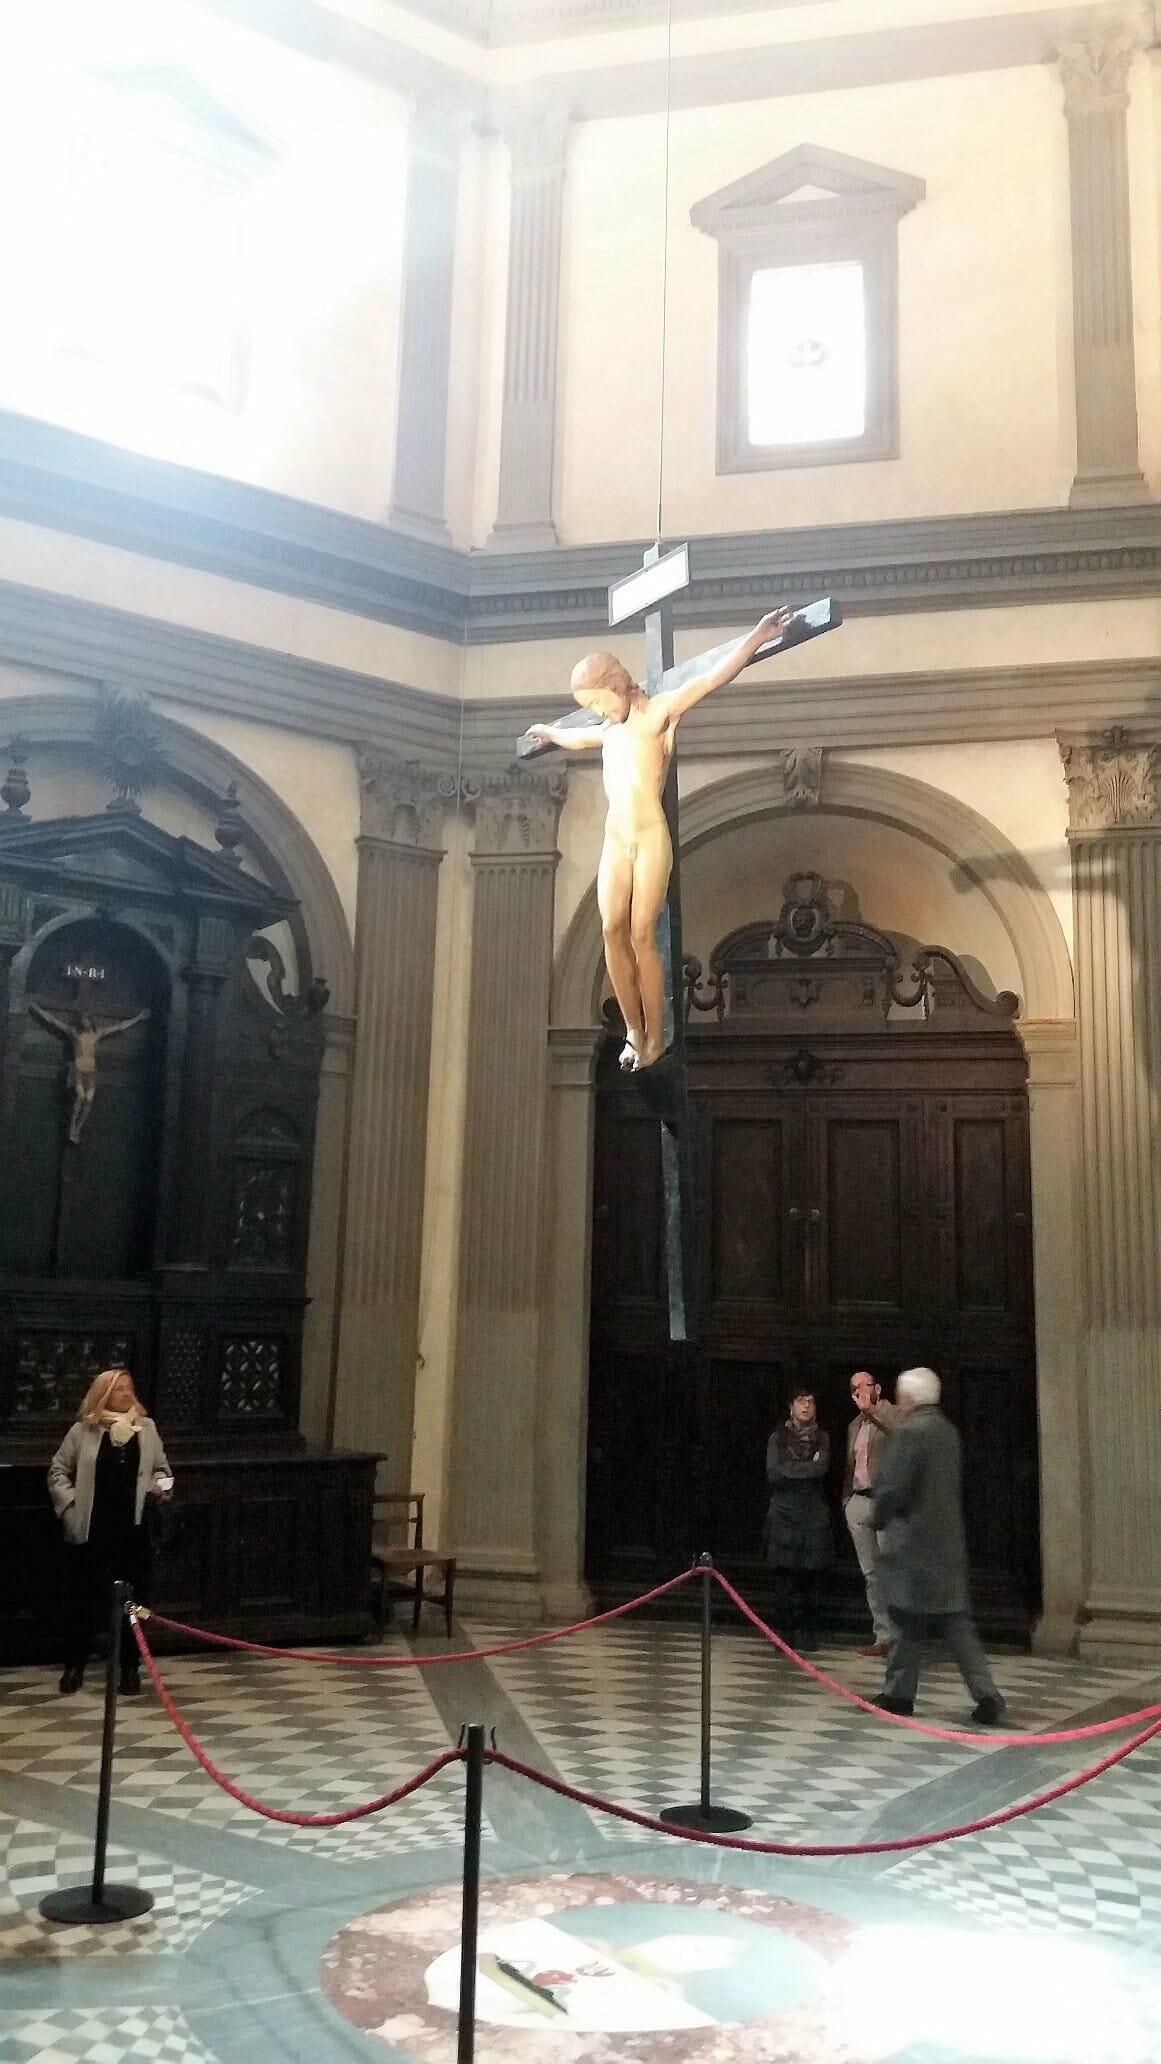 The Michelangelo's Crucifix in Holy Spirit